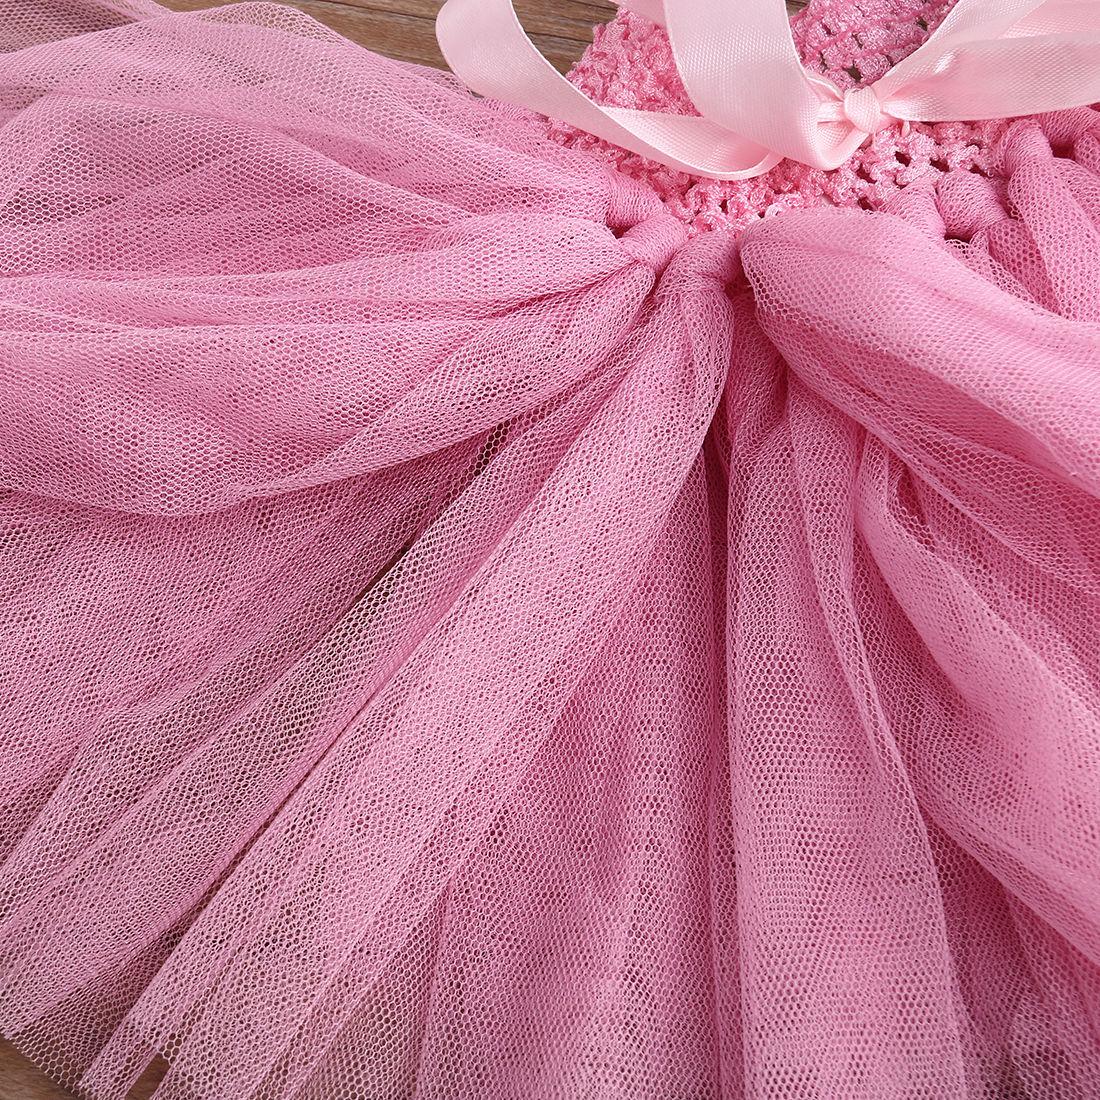 2016-New-Baby-Girls-Summer-Dress-kids-1st-Crown-Romper-Headband-Birthday-Tutu-Dress-Outfit-3pcs-5